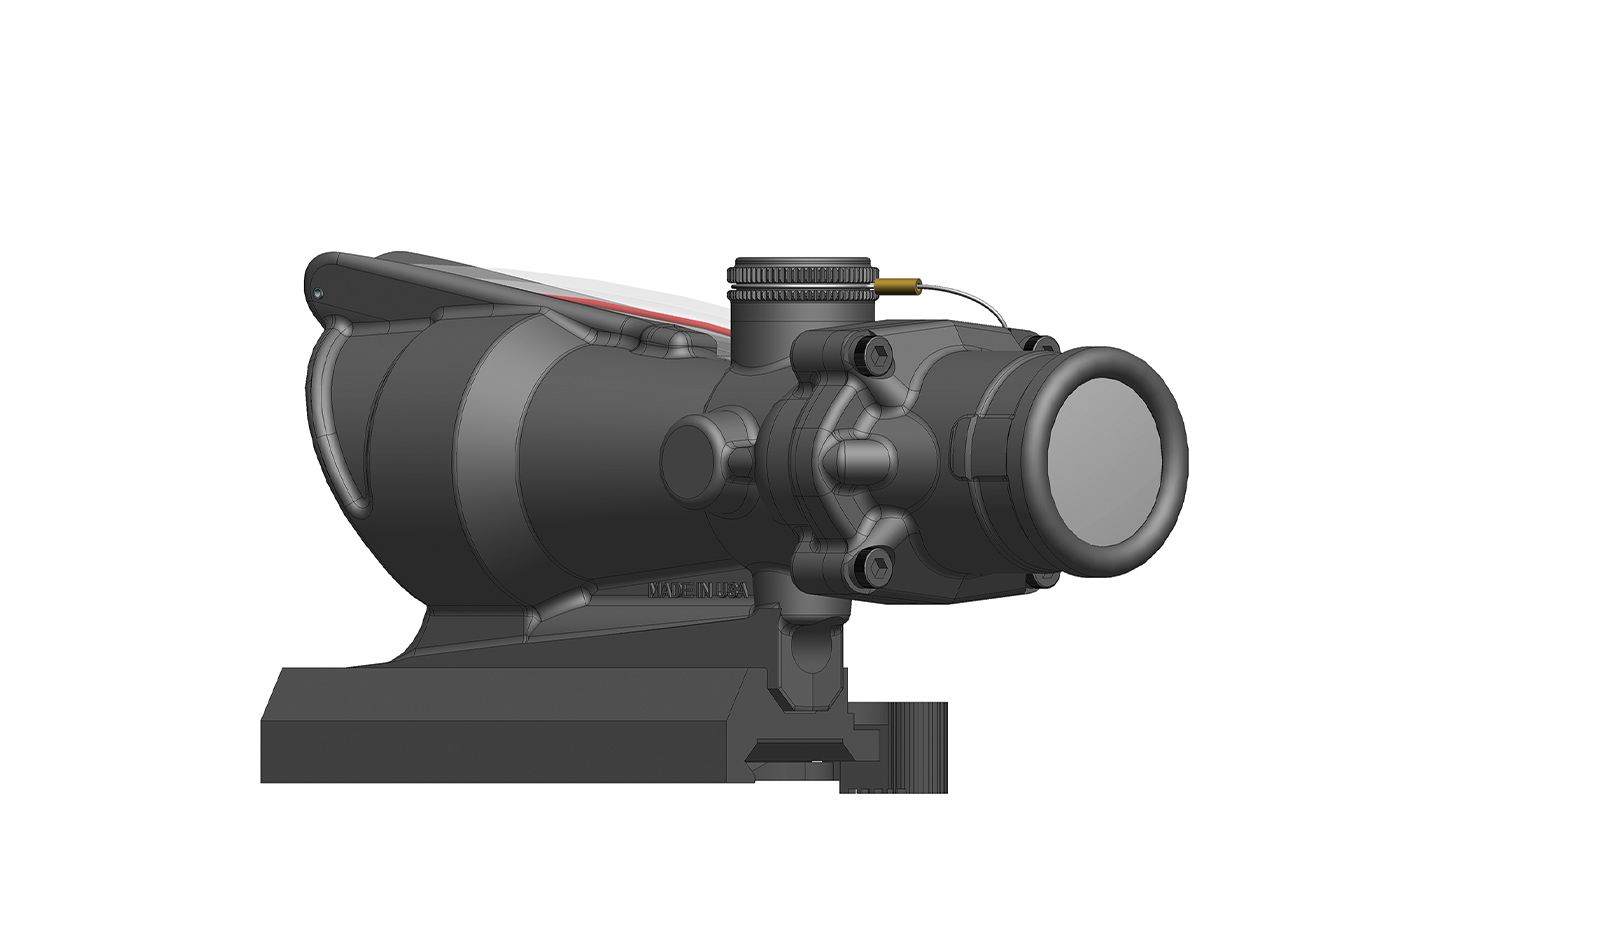 TA31-D-100582 angle 3